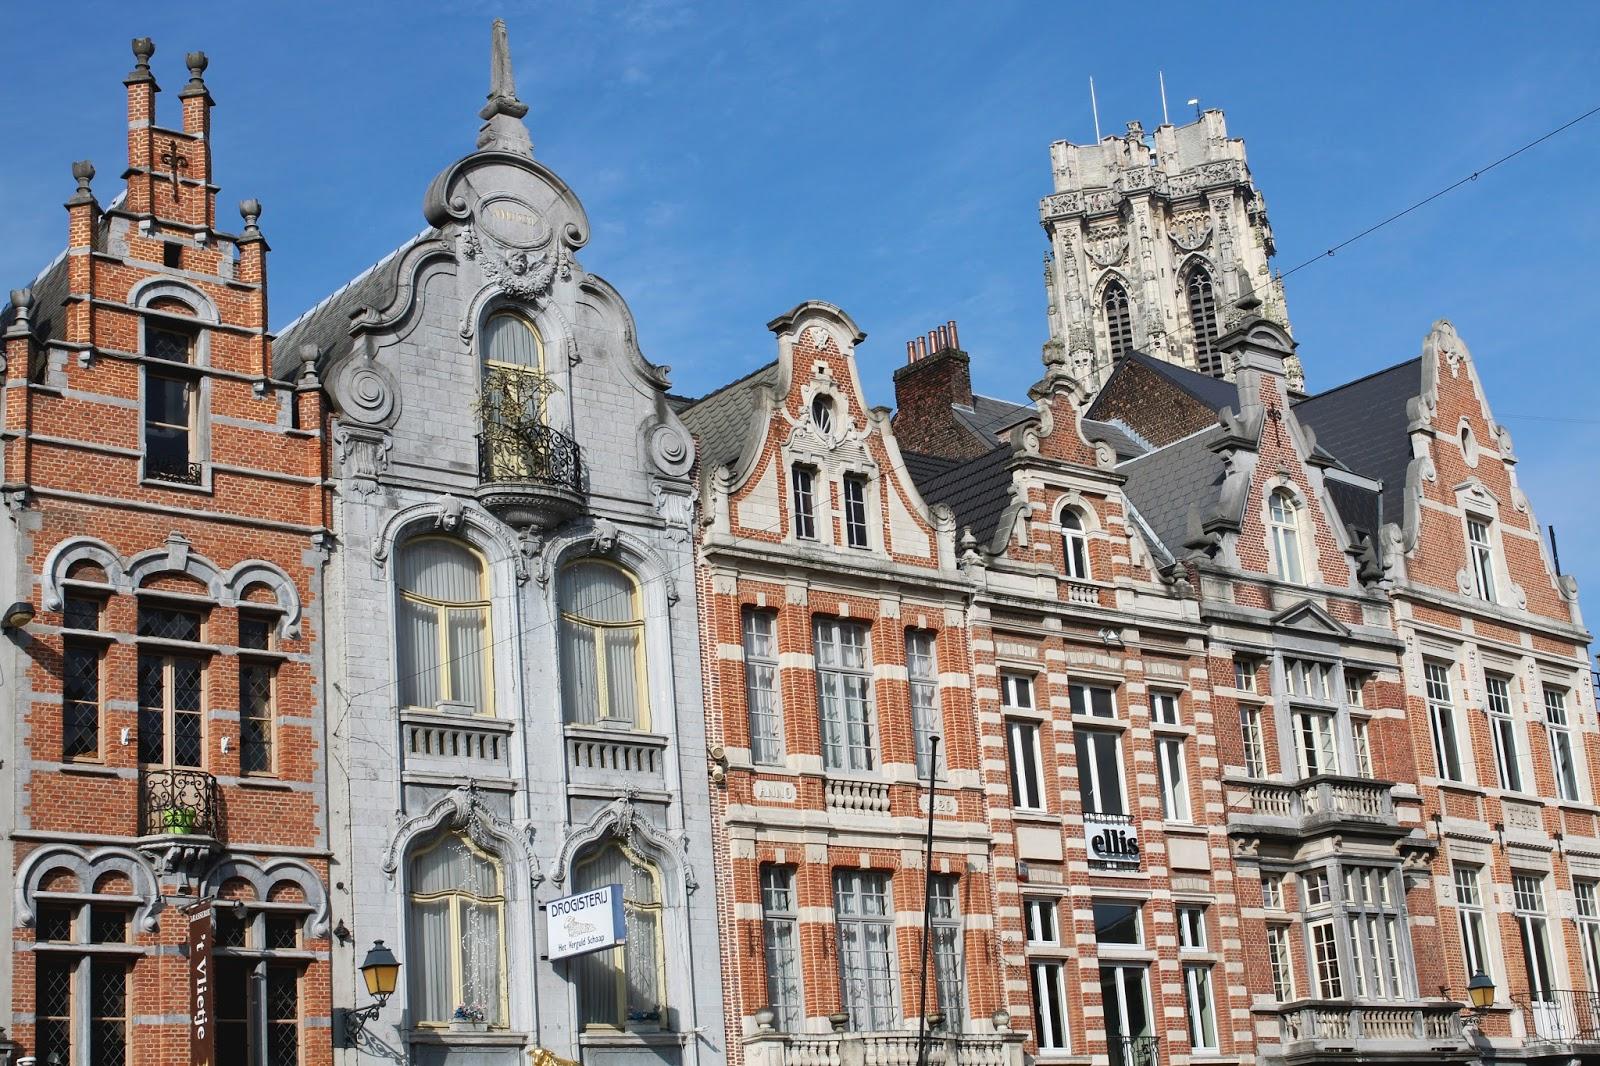 My tips for Mechelen (Antwerp)